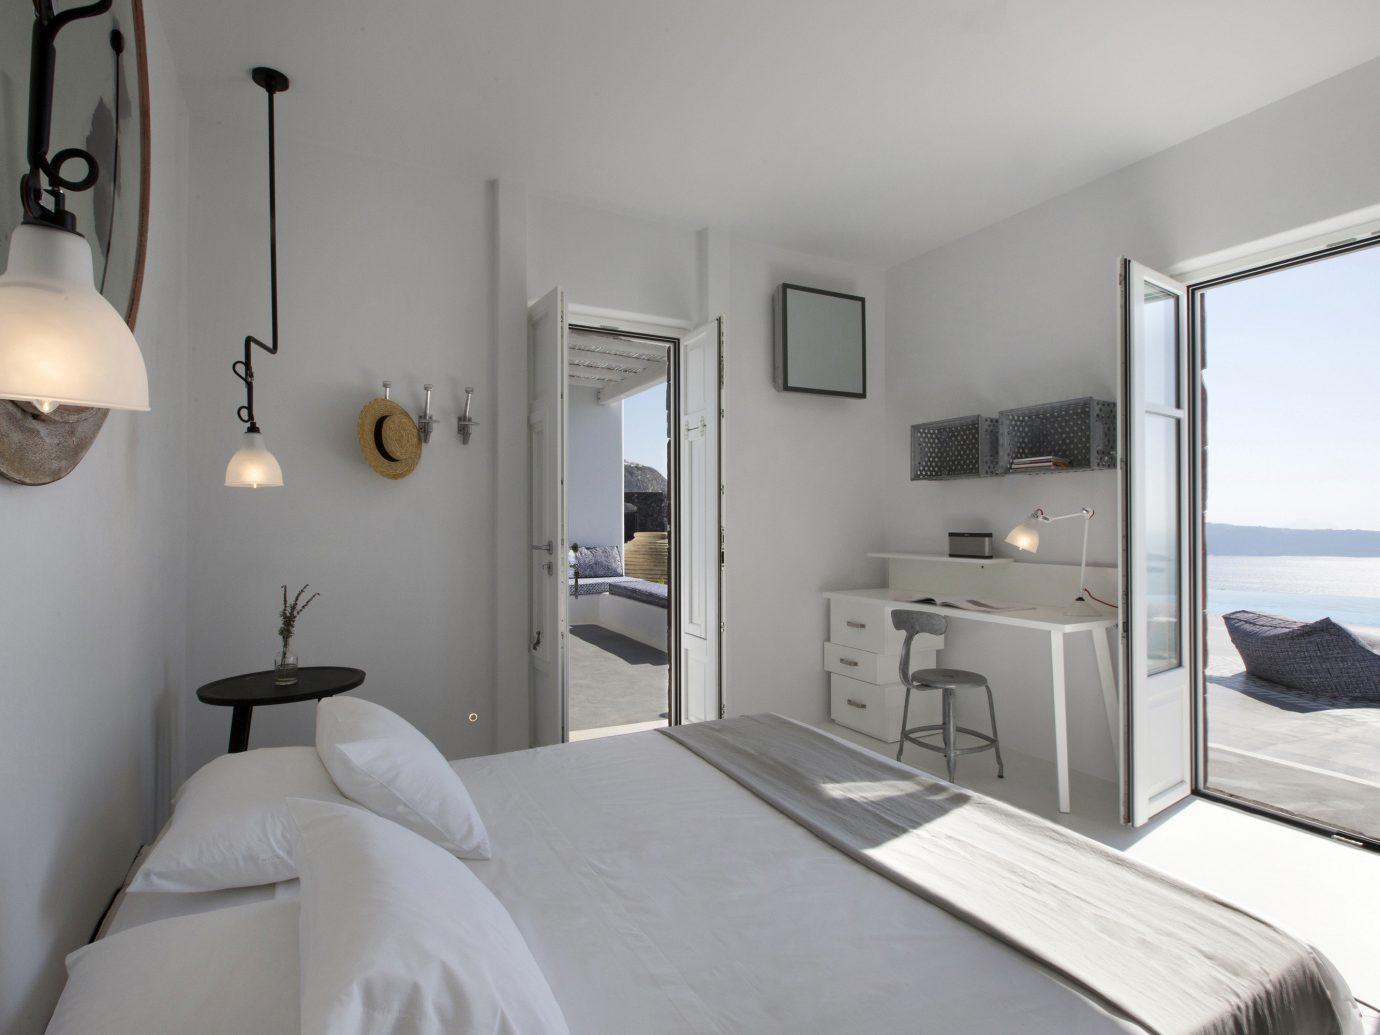 Greece Hotels Santorini wall indoor room mirror bed ceiling scene interior design Bedroom Suite real estate interior designer hotel decorated furniture